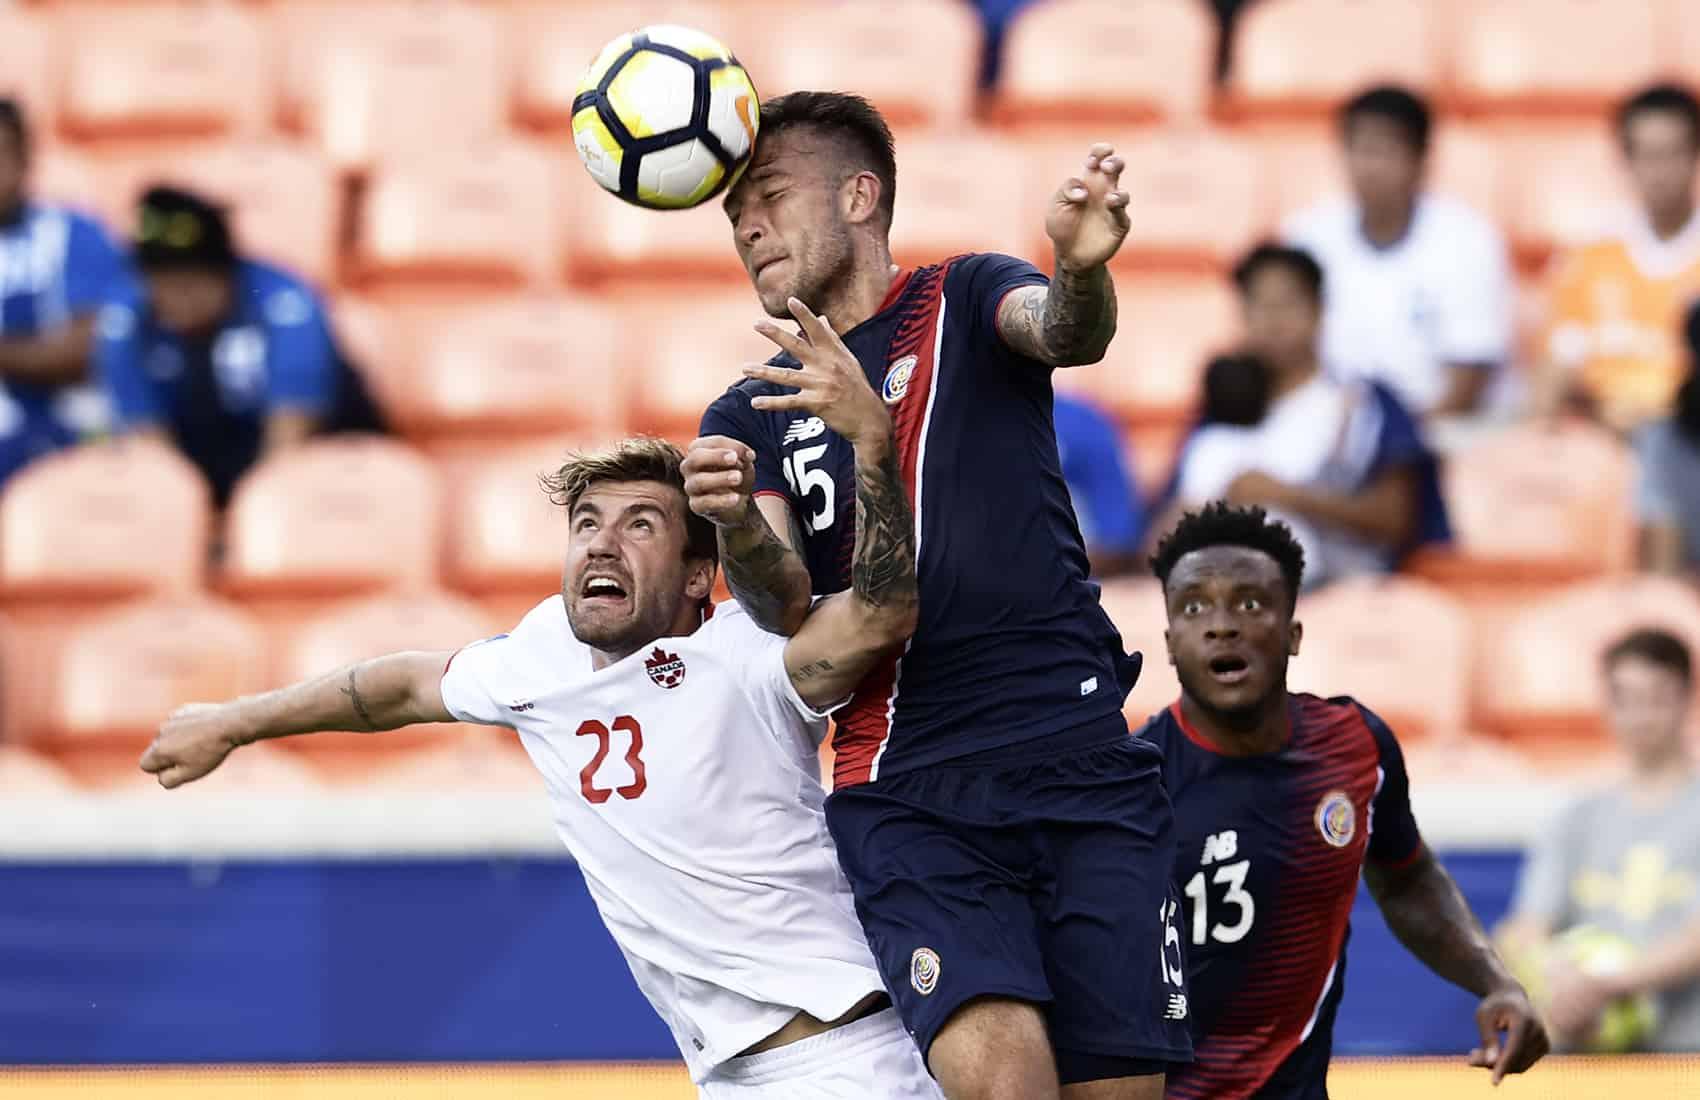 Costa Rica 1 - 1 Canada. 2017 CONCACAF Gold Cup. July 11, 2017. La Sele